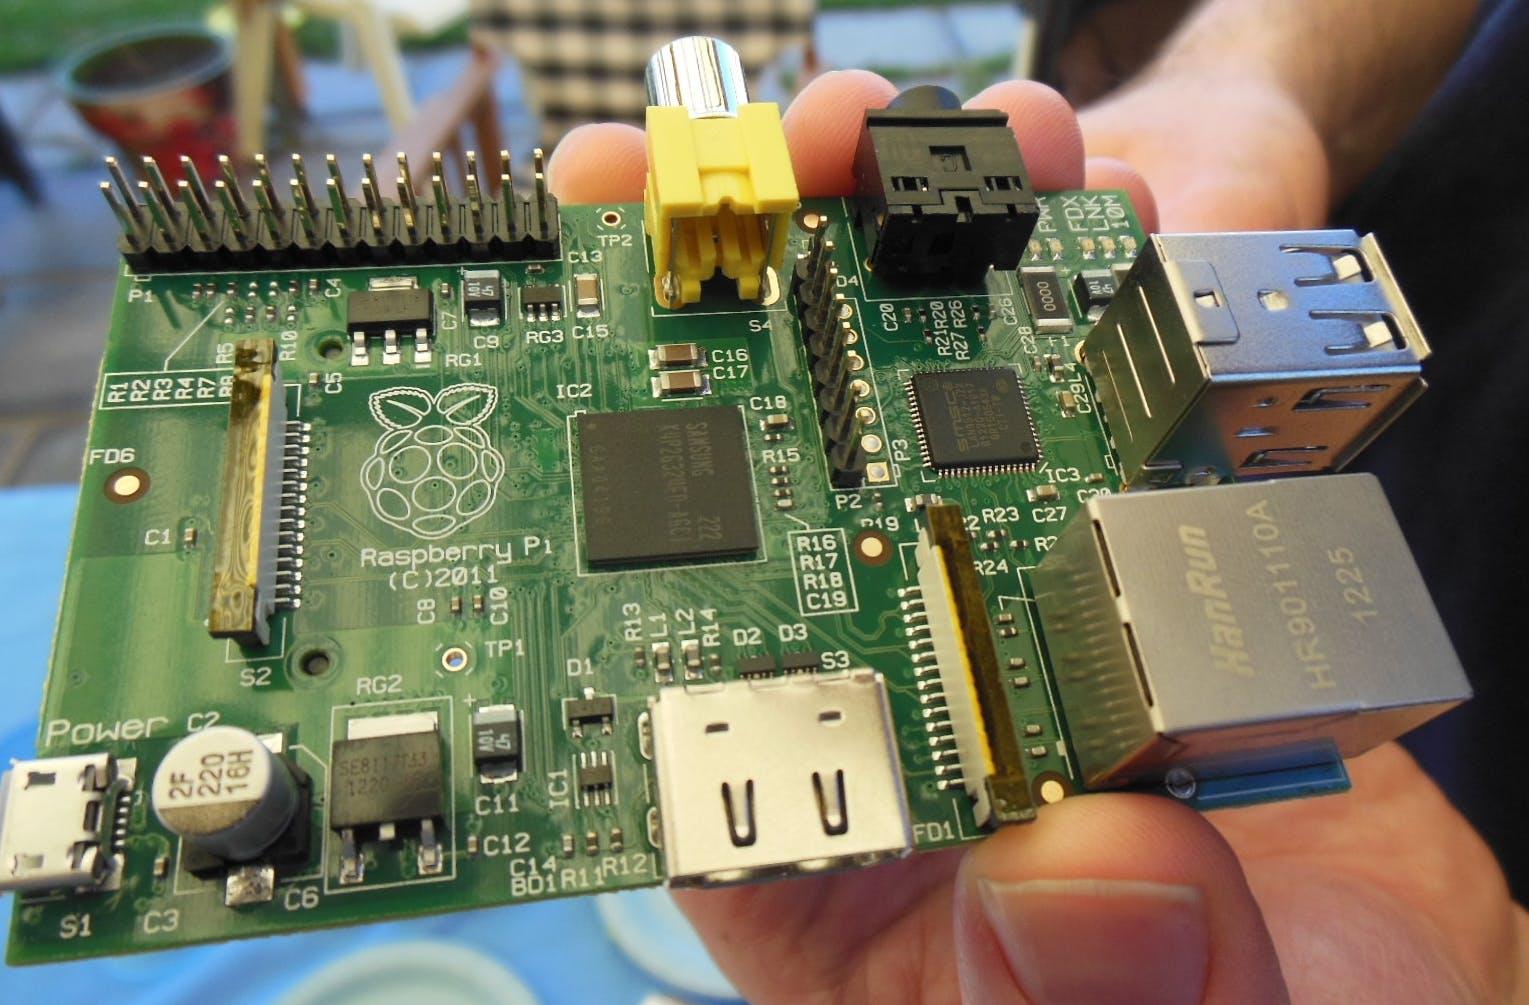 Mach's Dir selbst – iBeacon mit dem Rasperry Pi selber bauen